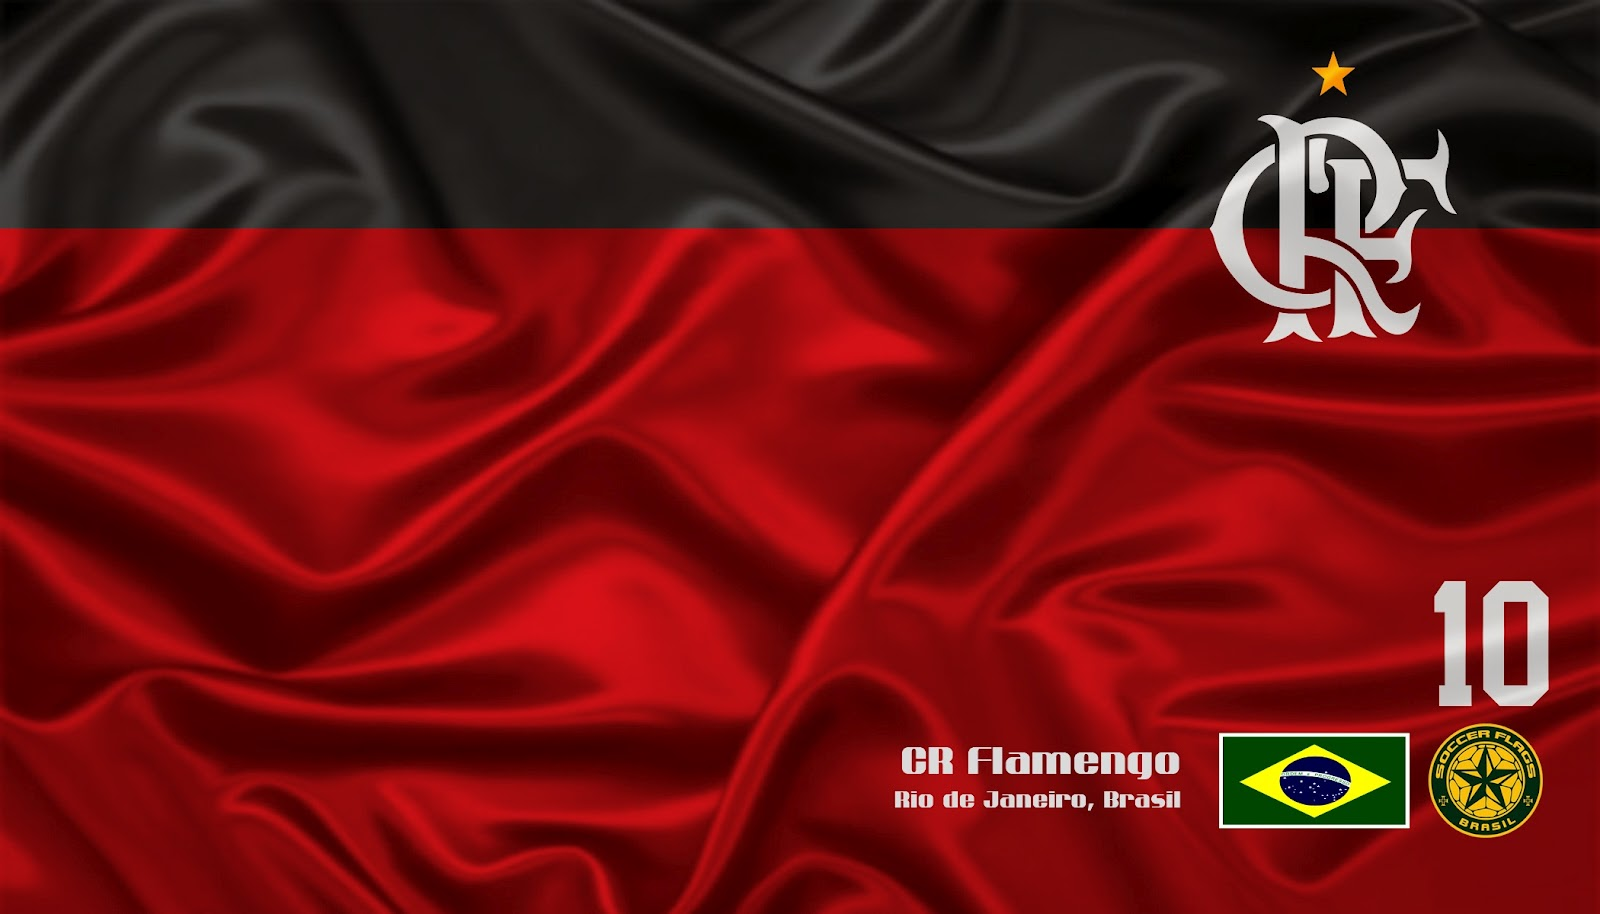 http://3.bp.blogspot.com/-bRRyzw5uYyE/UCpnETRjM6I/AAAAAAAACb4/rkb420Lufw0/s1600/Flamengo+(1).jpg